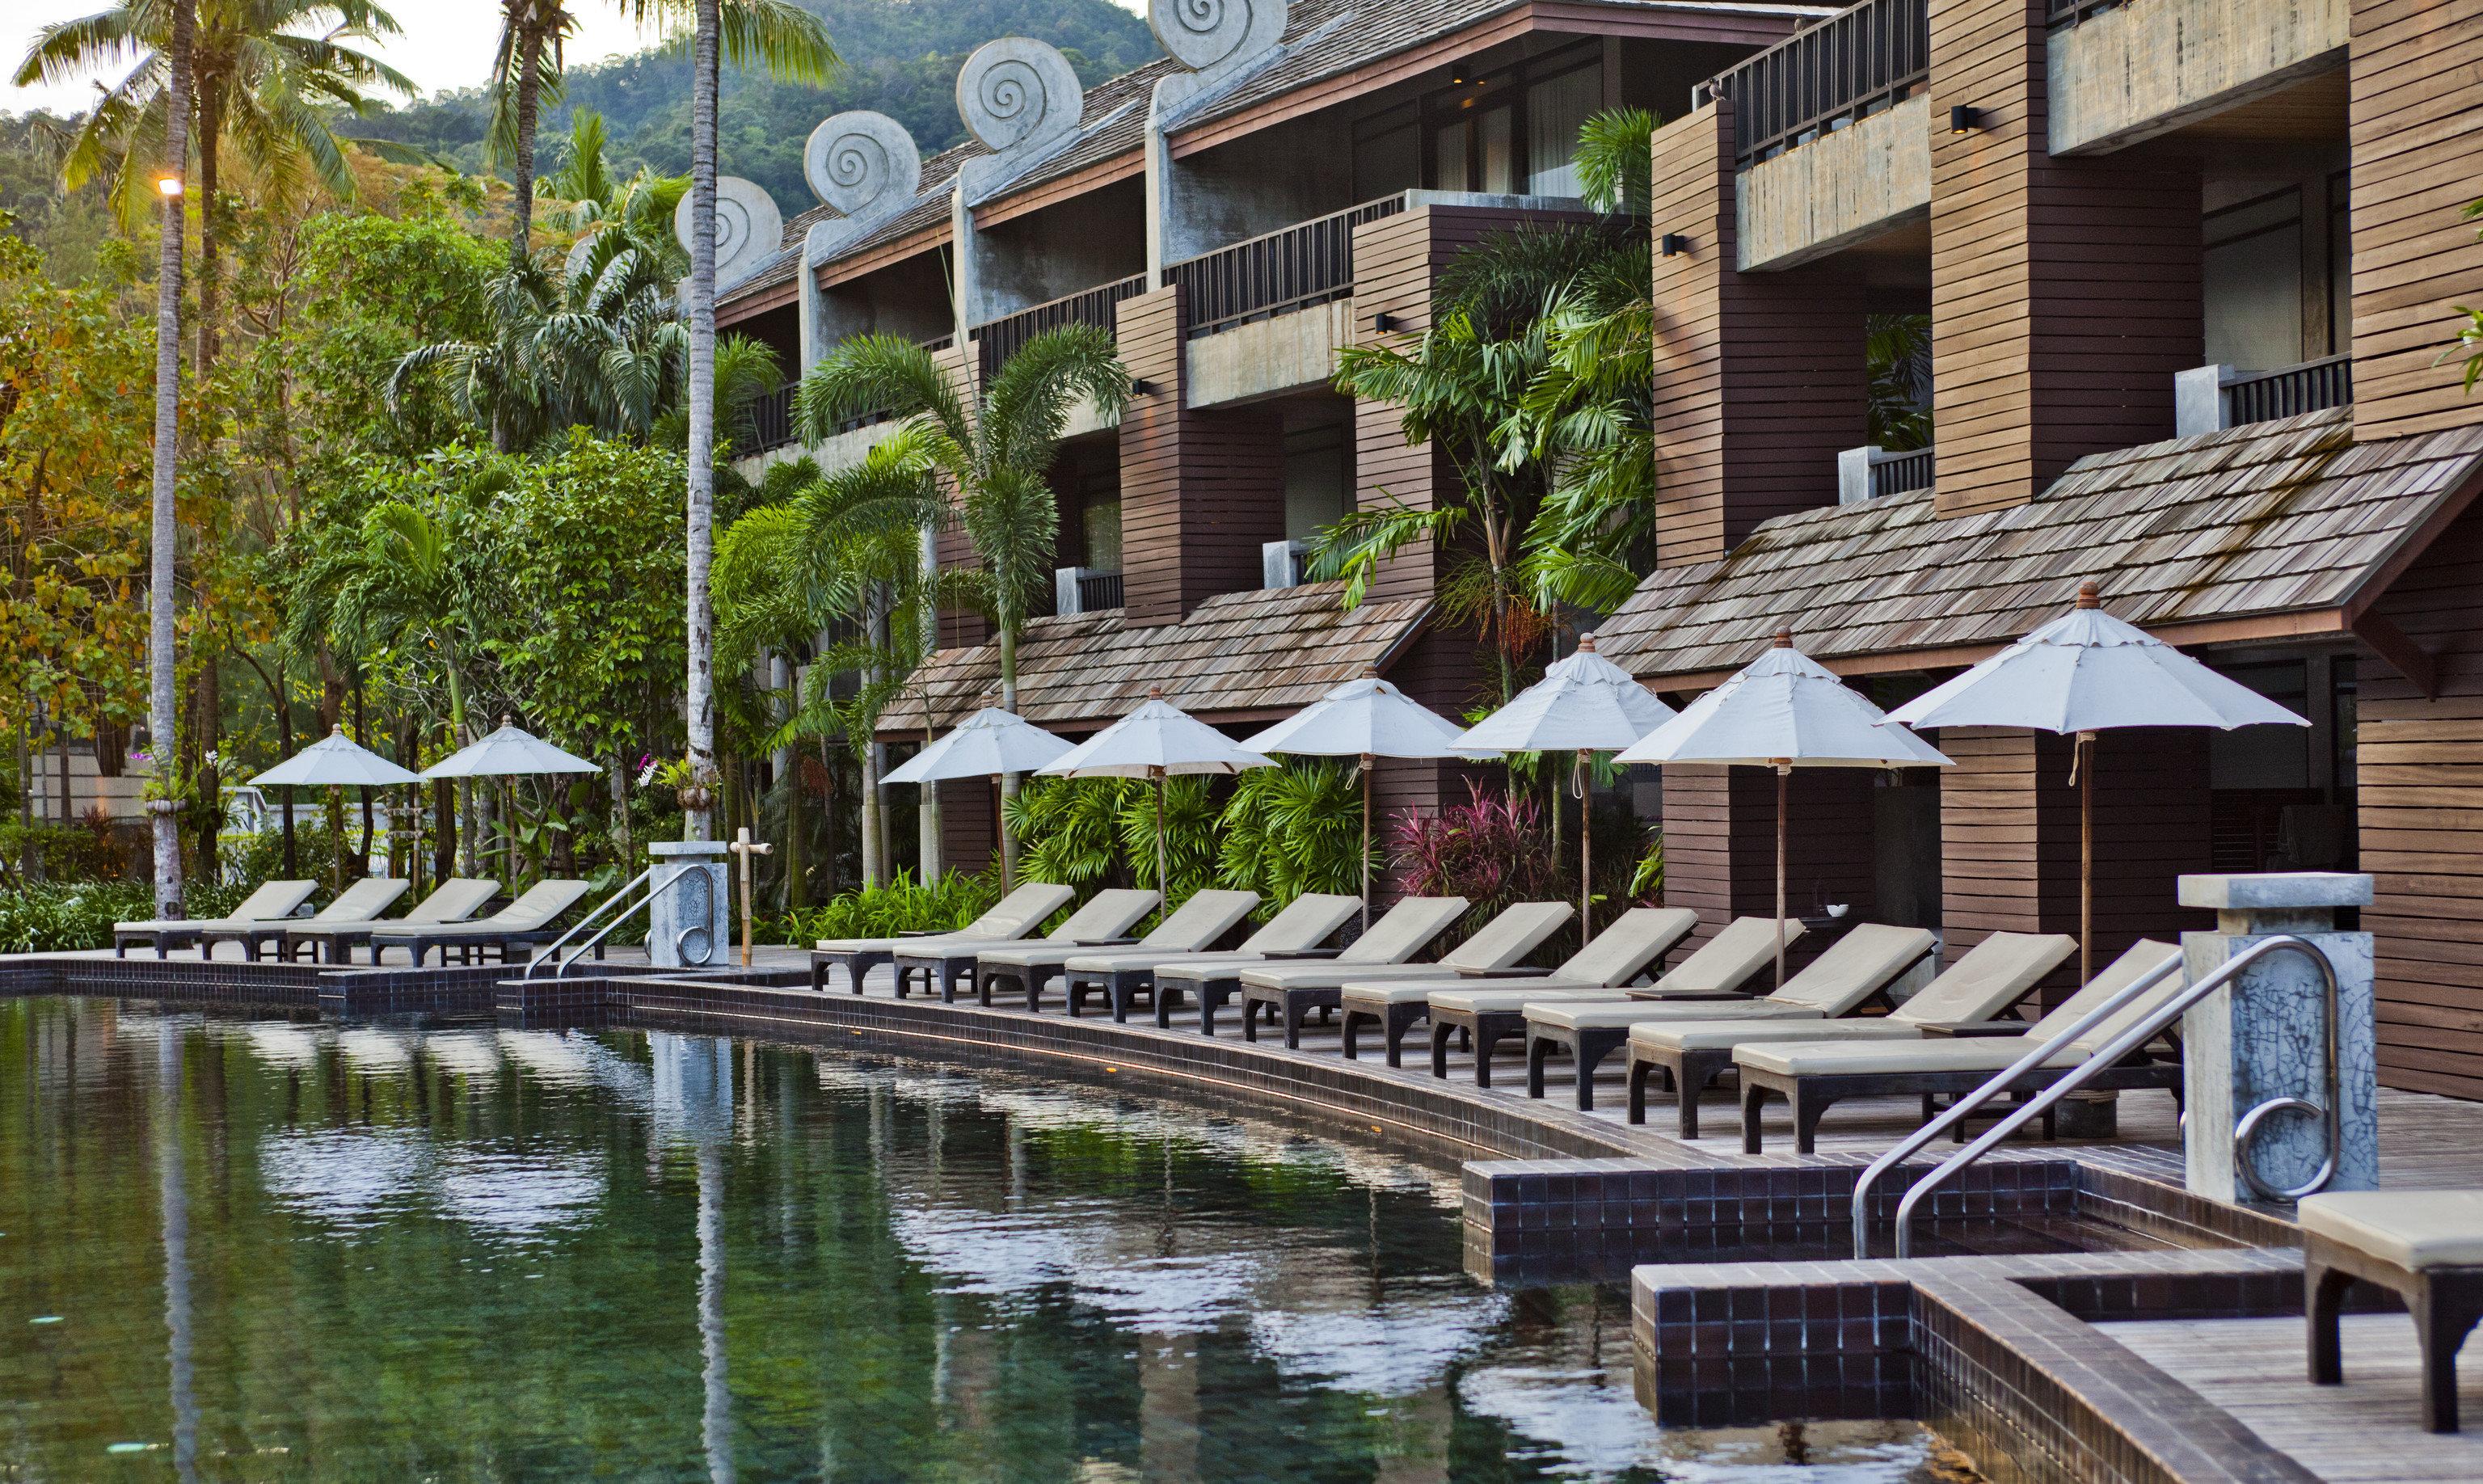 Jetsetter Guides outdoor building tree estate condominium Resort walkway residential area waterway dock several